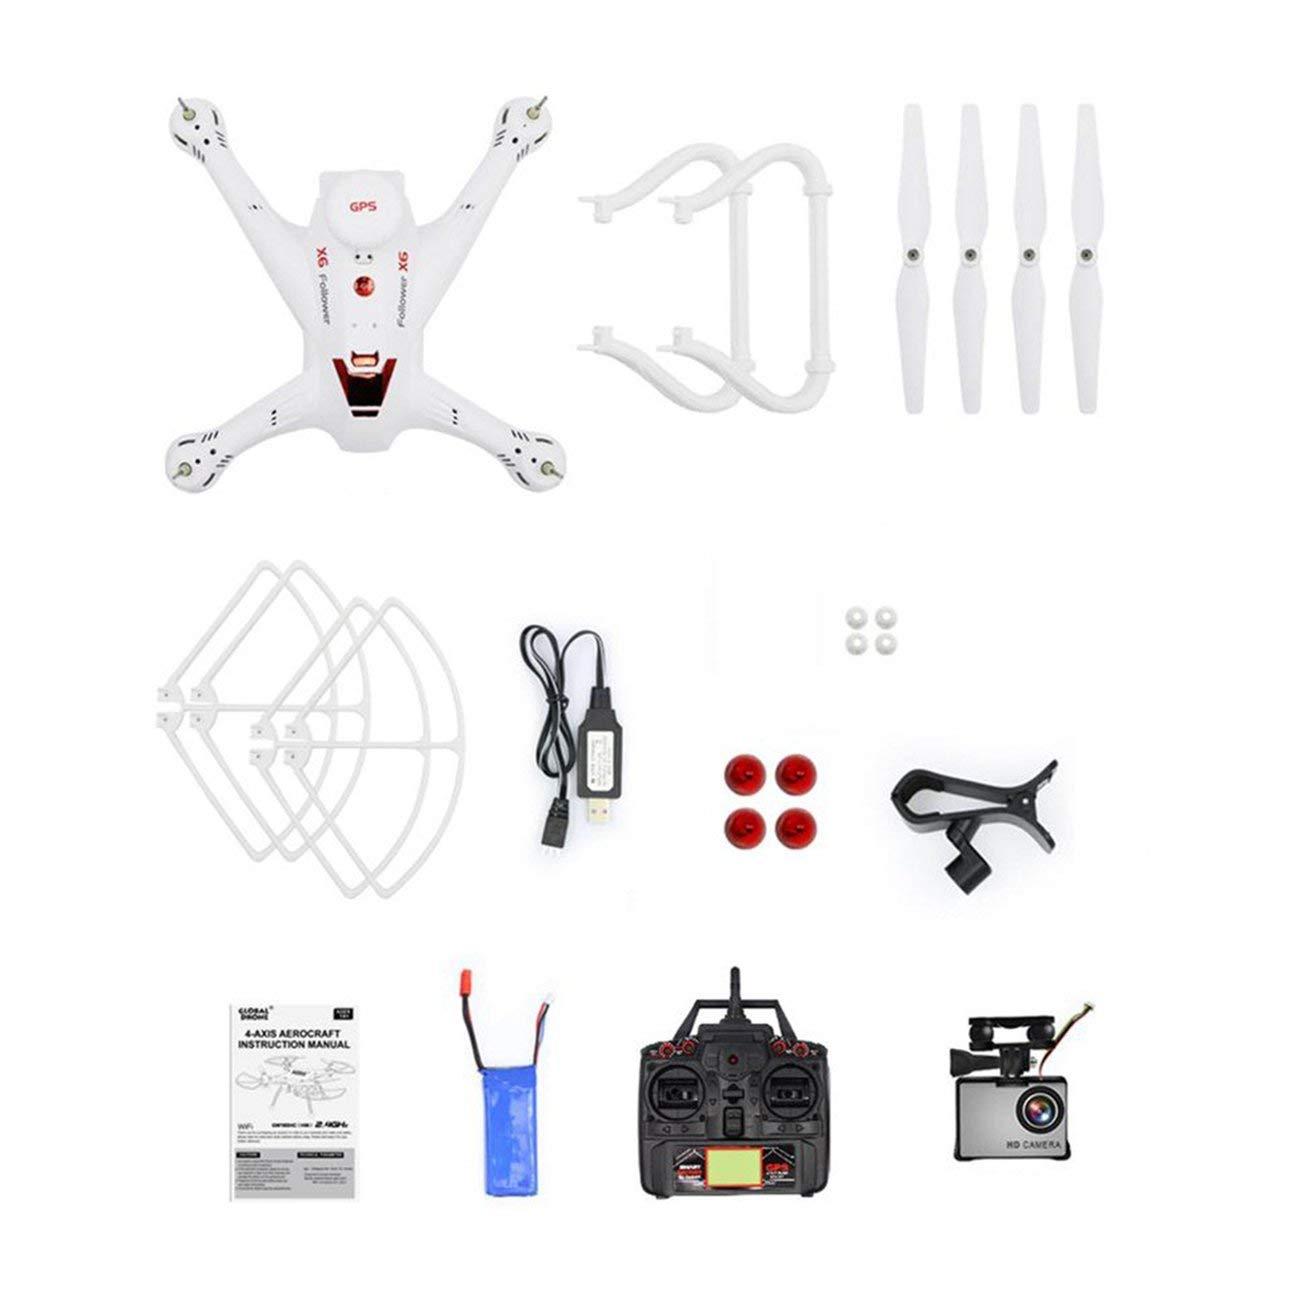 Liobaba X183S RC Drone 1080P 5G Camera Headless Mode Altitude Hold One Key Return Mini Remote Control GPS Quadrocopter